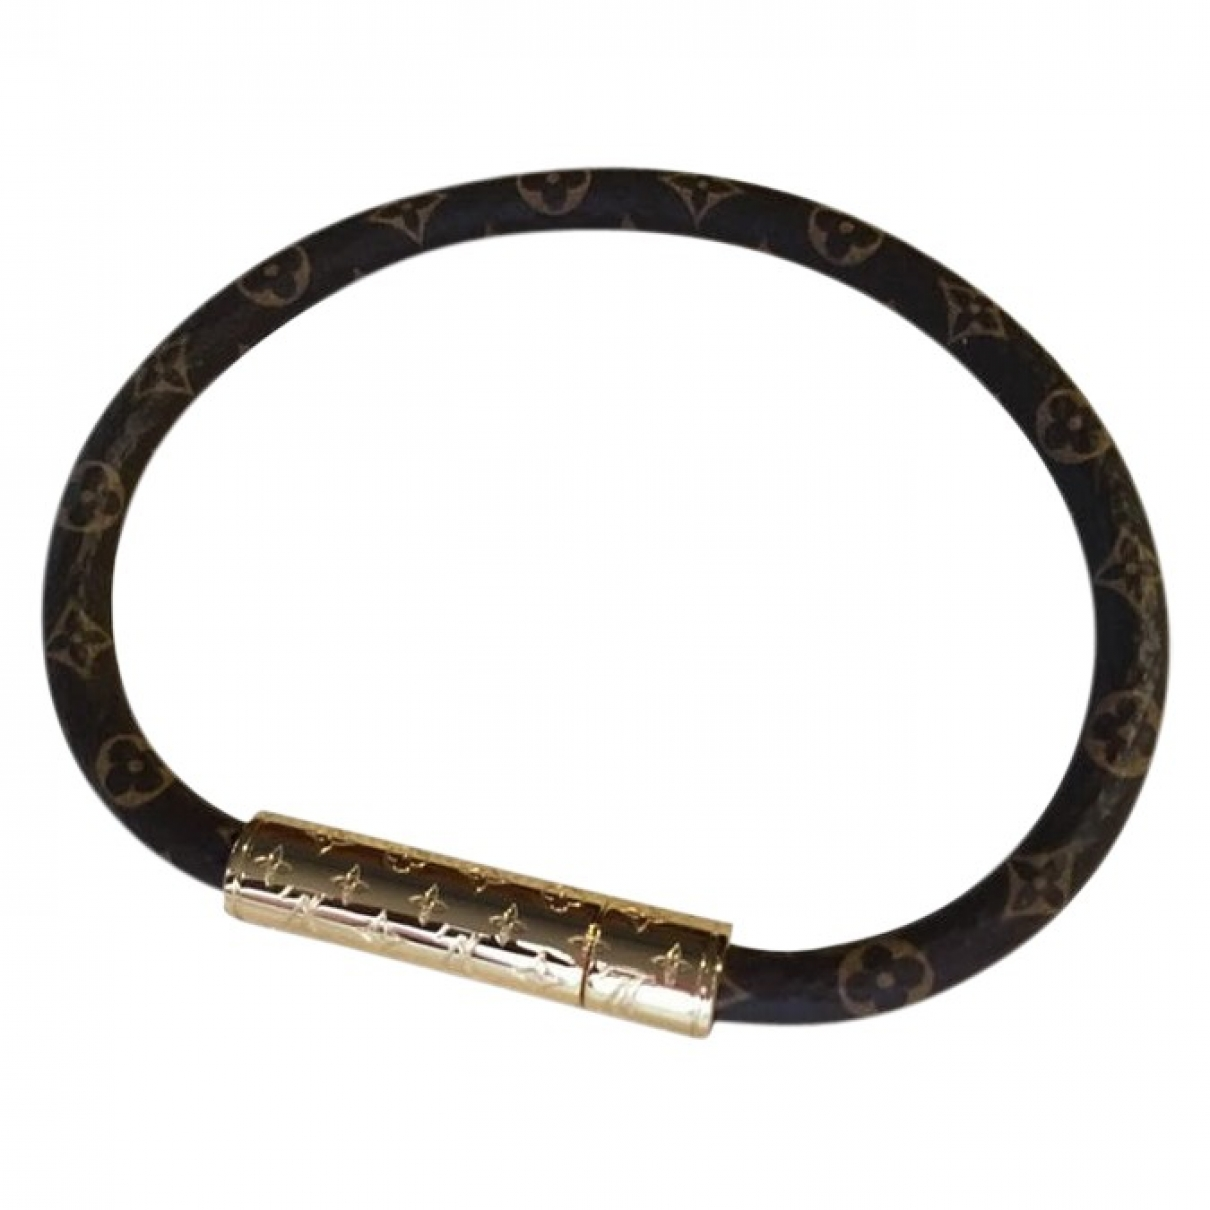 Louis Vuitton LV Confidential Armband in  Bunt Leinen